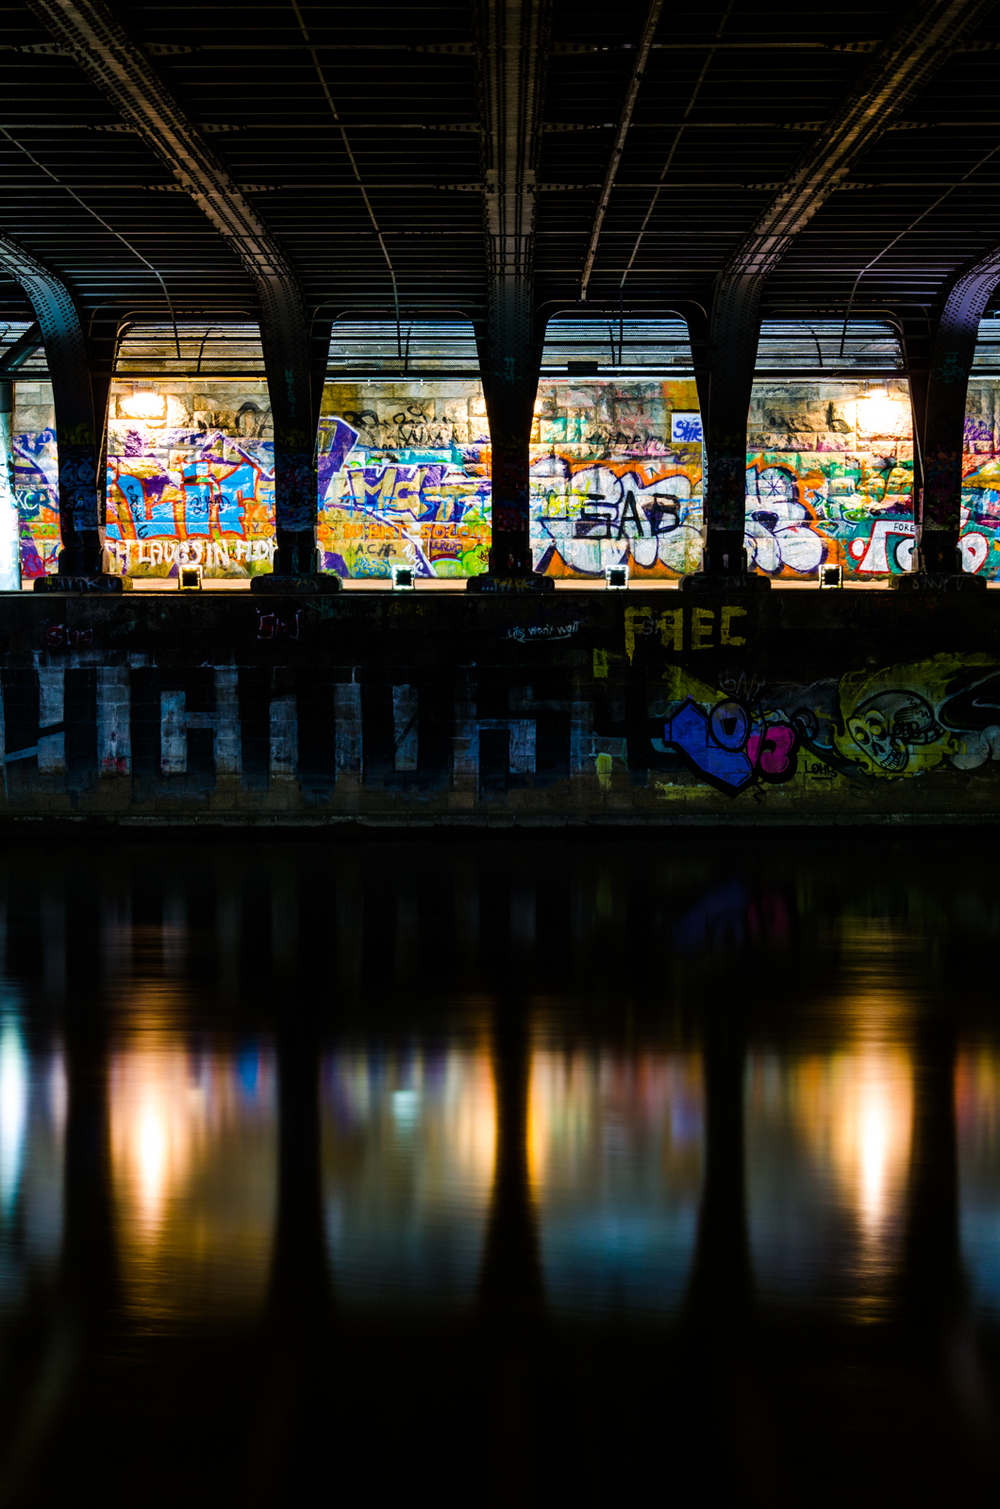 Project 365: #129 - Under the bridge